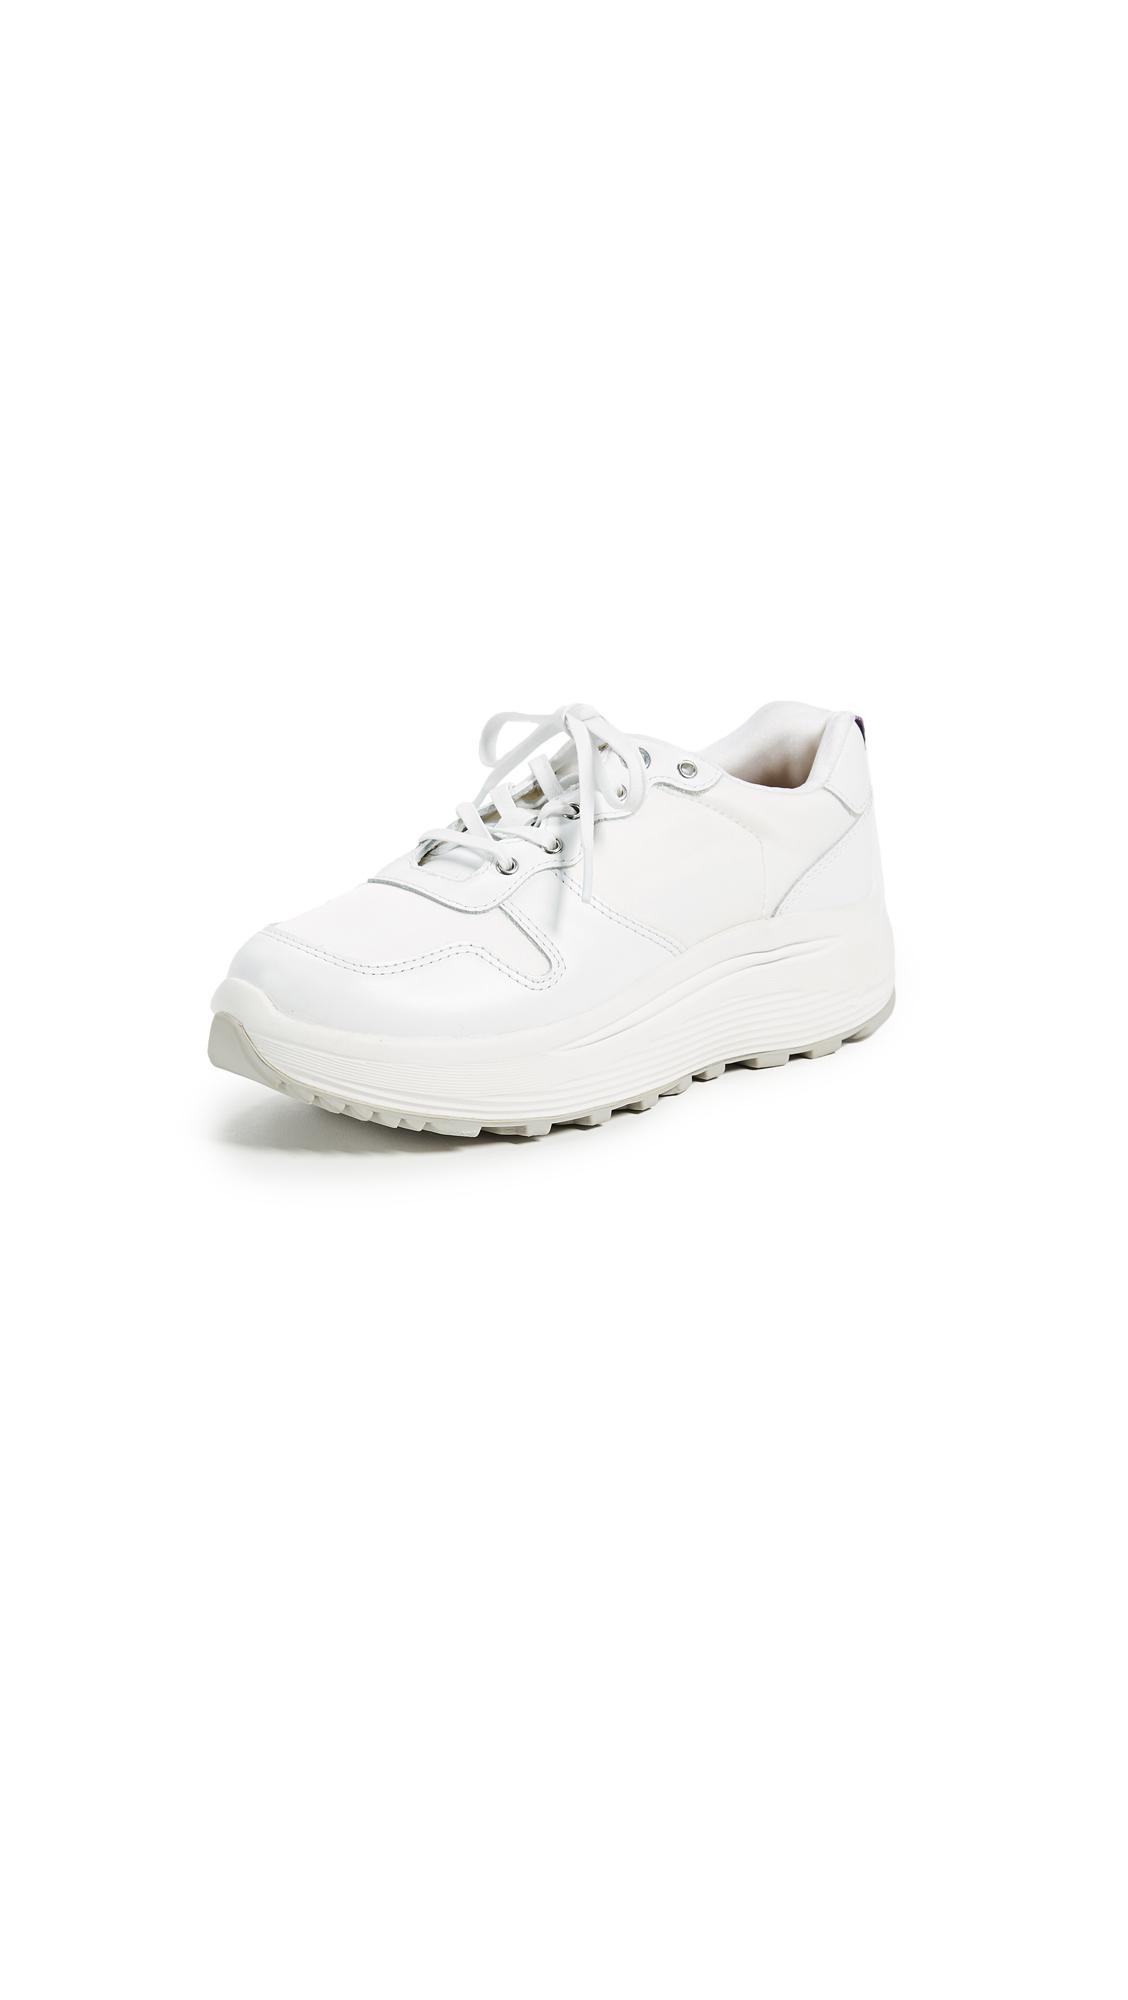 Eytys Jet Combo Sneakers - White